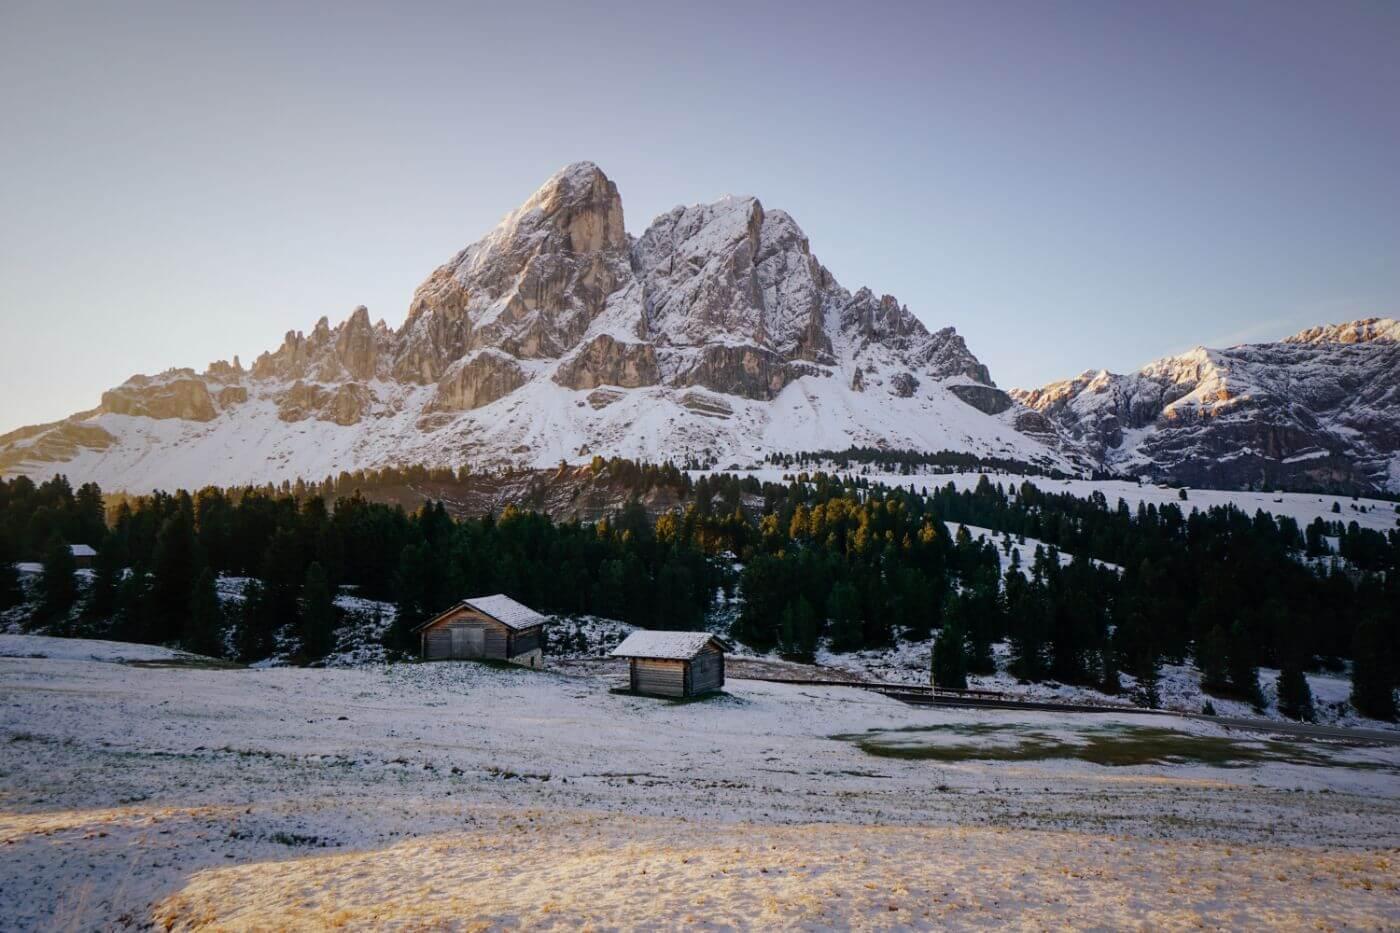 Sass de Putia Circuit, Hiking in the Dolomites